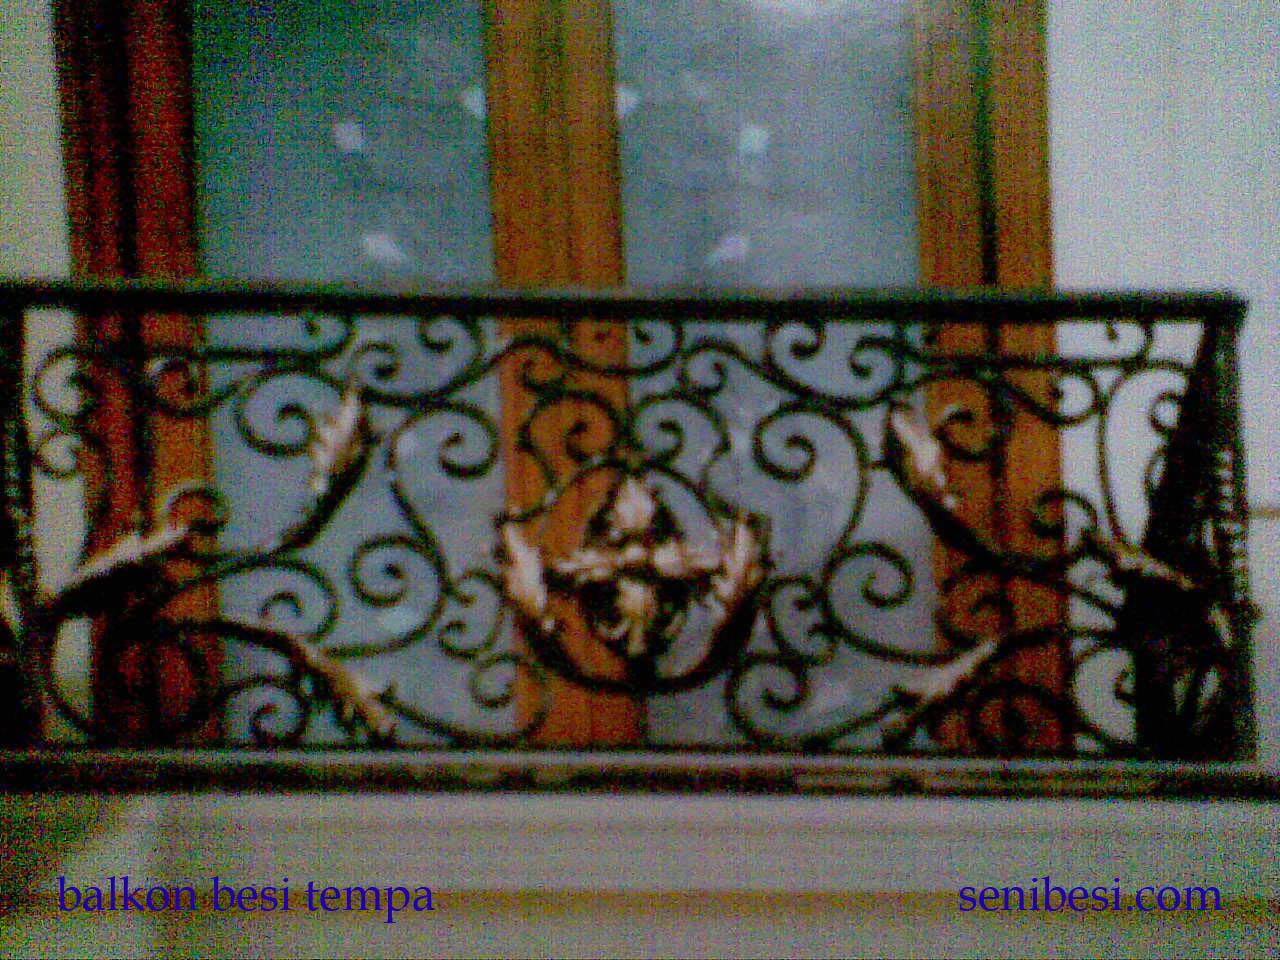 besi tempa ,pintu,pagar,balkon,railing tangga